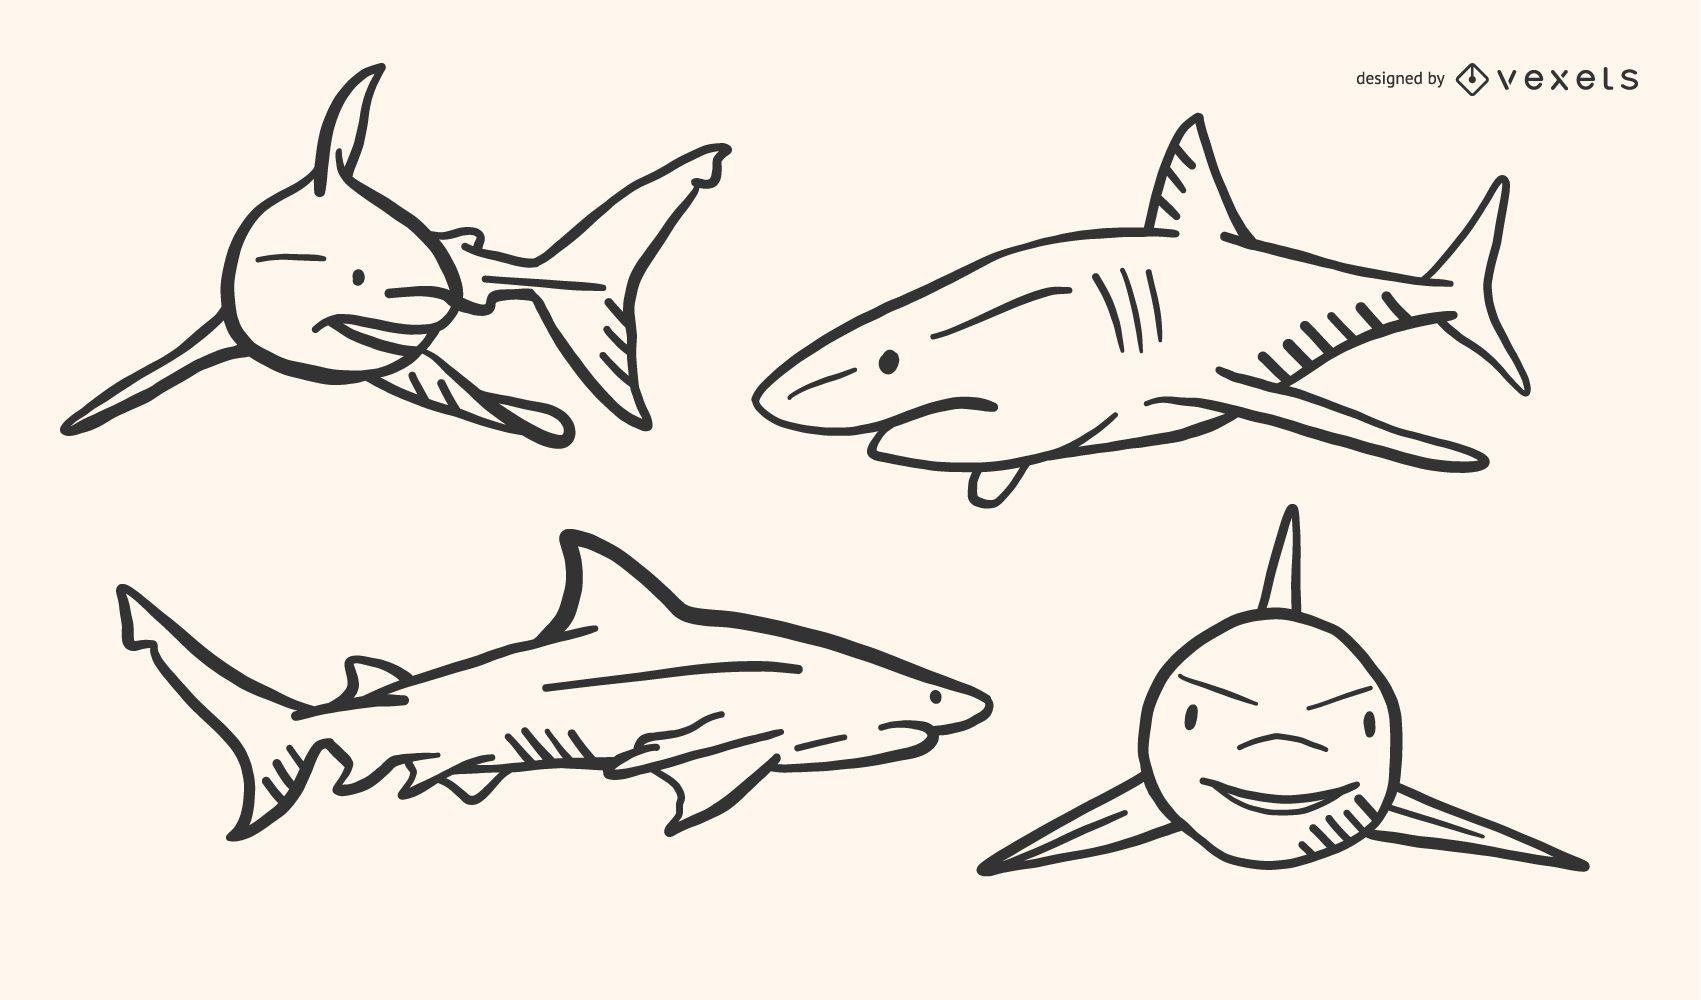 Tibur?n garabato vector conjunto